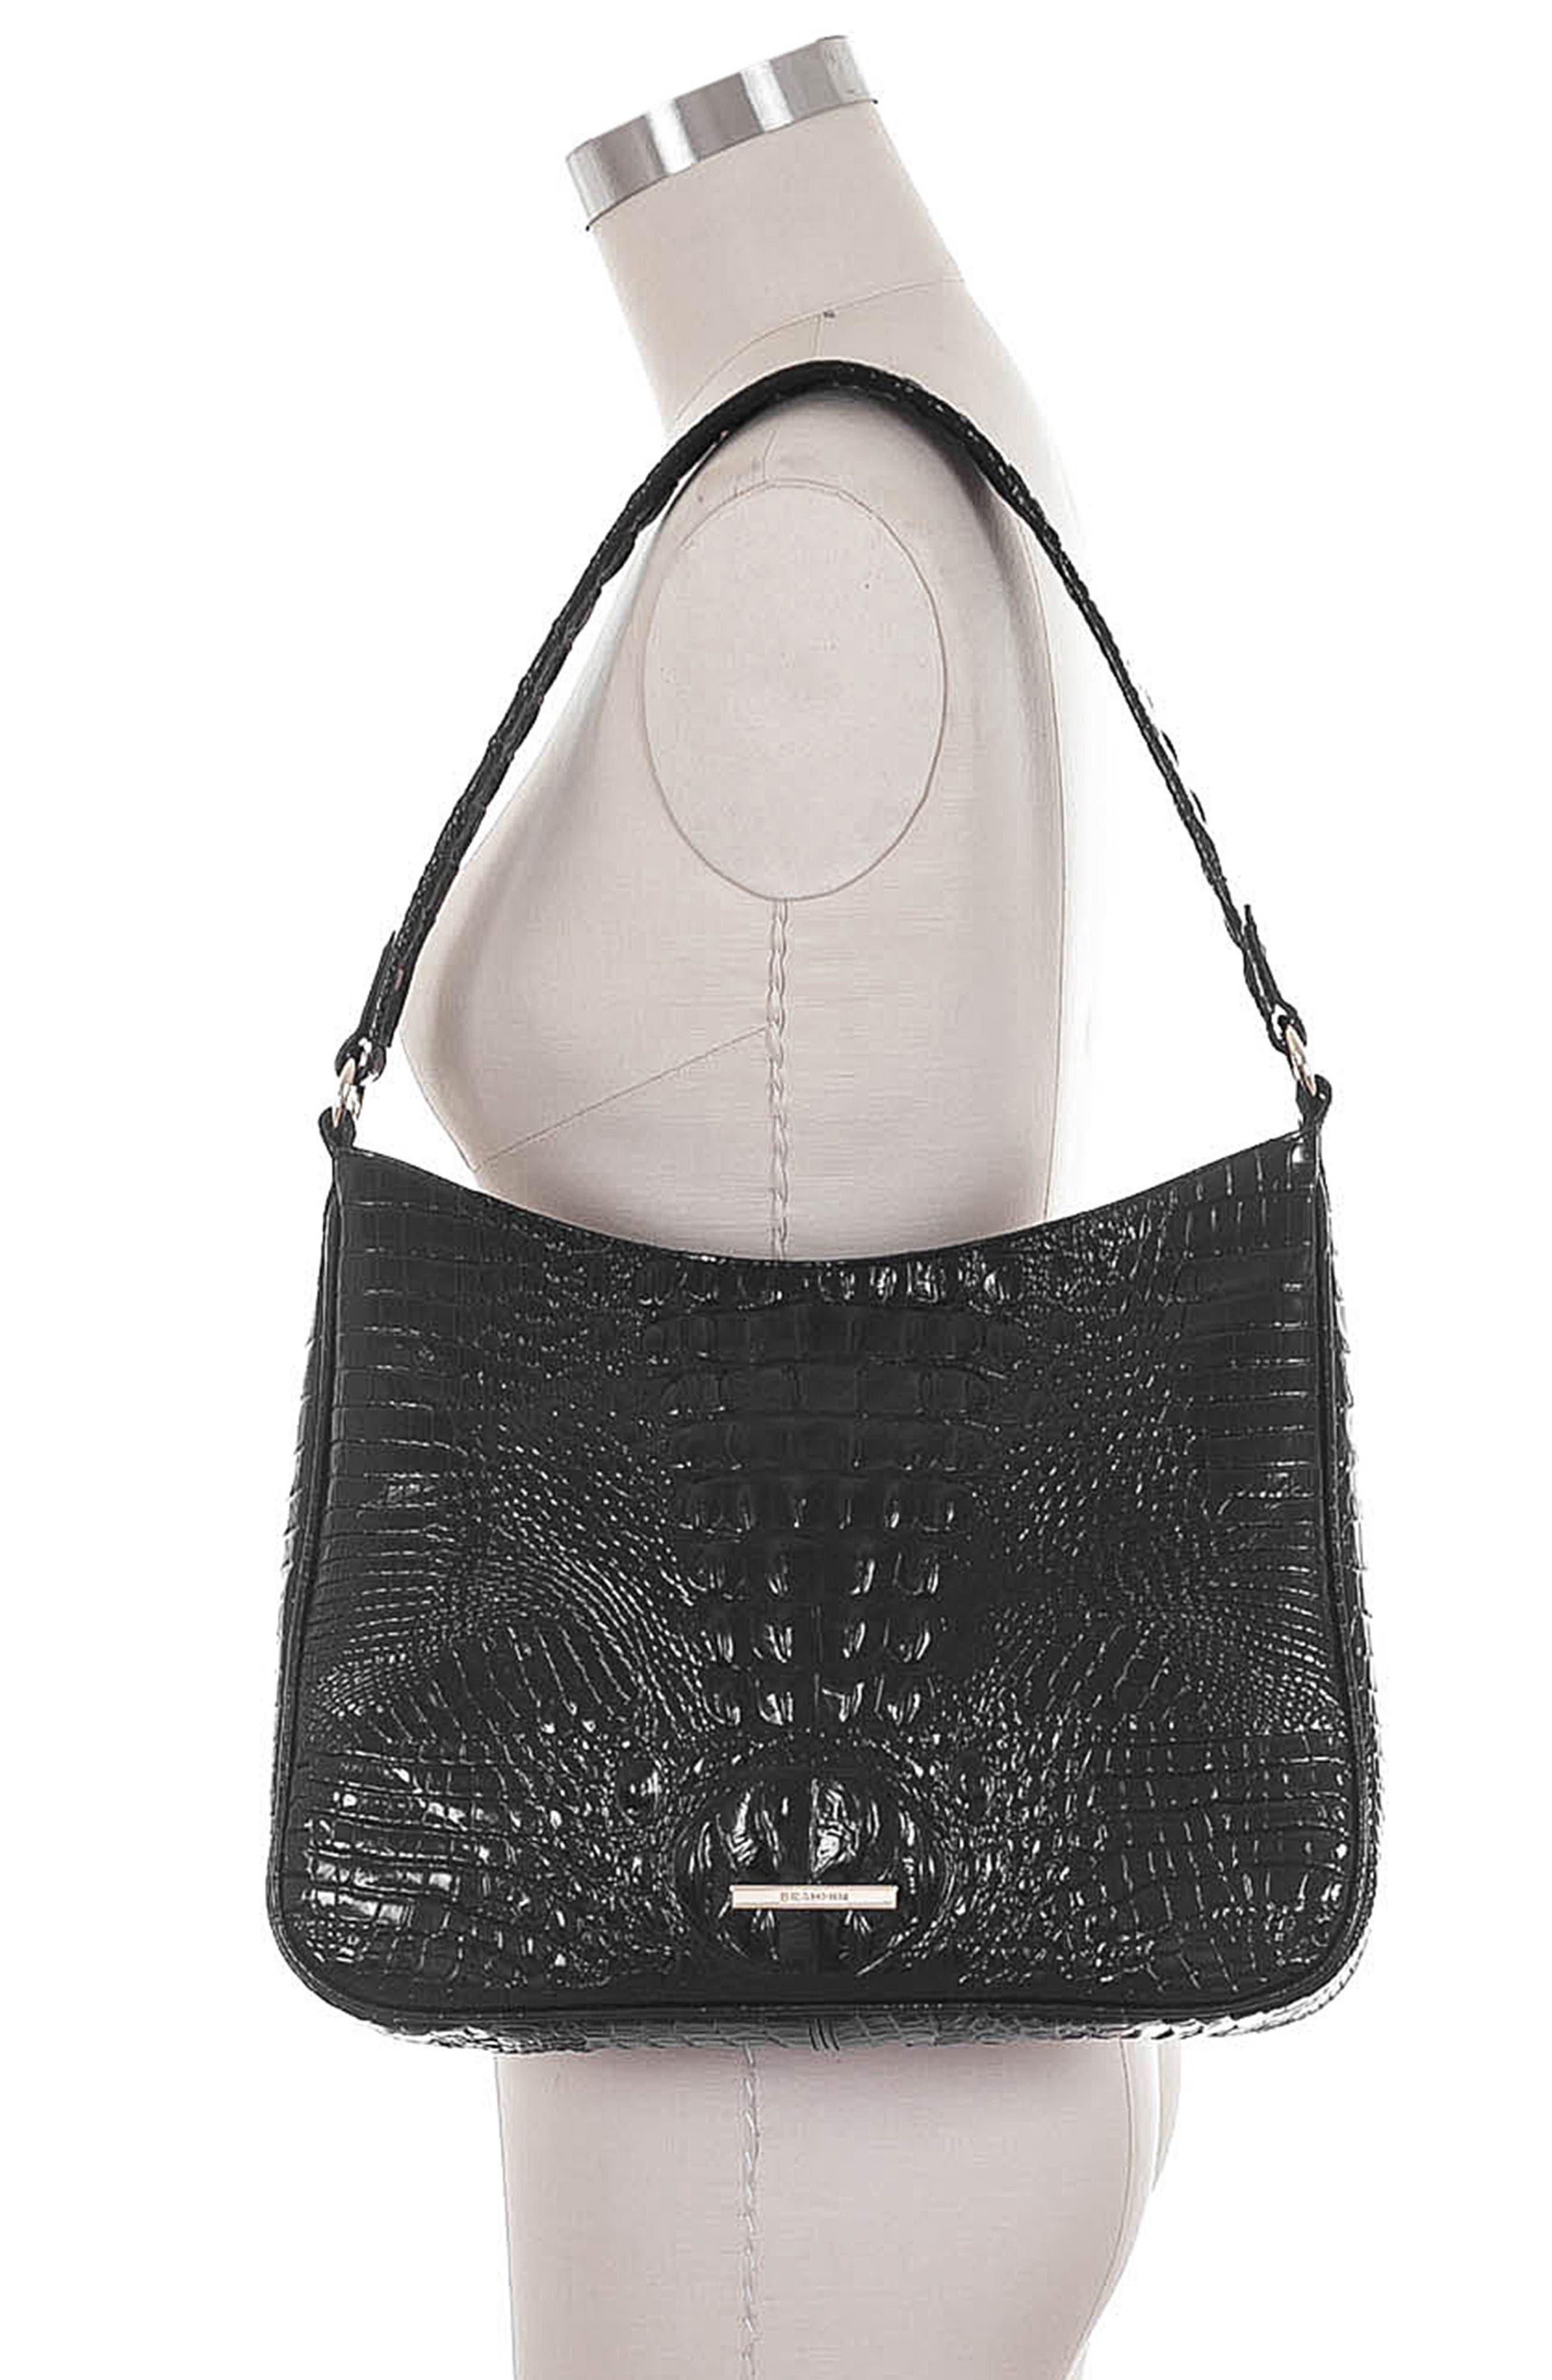 Noelle Croc Embossed Leather Hobo Bag,                             Alternate thumbnail 2, color,                             BLACK